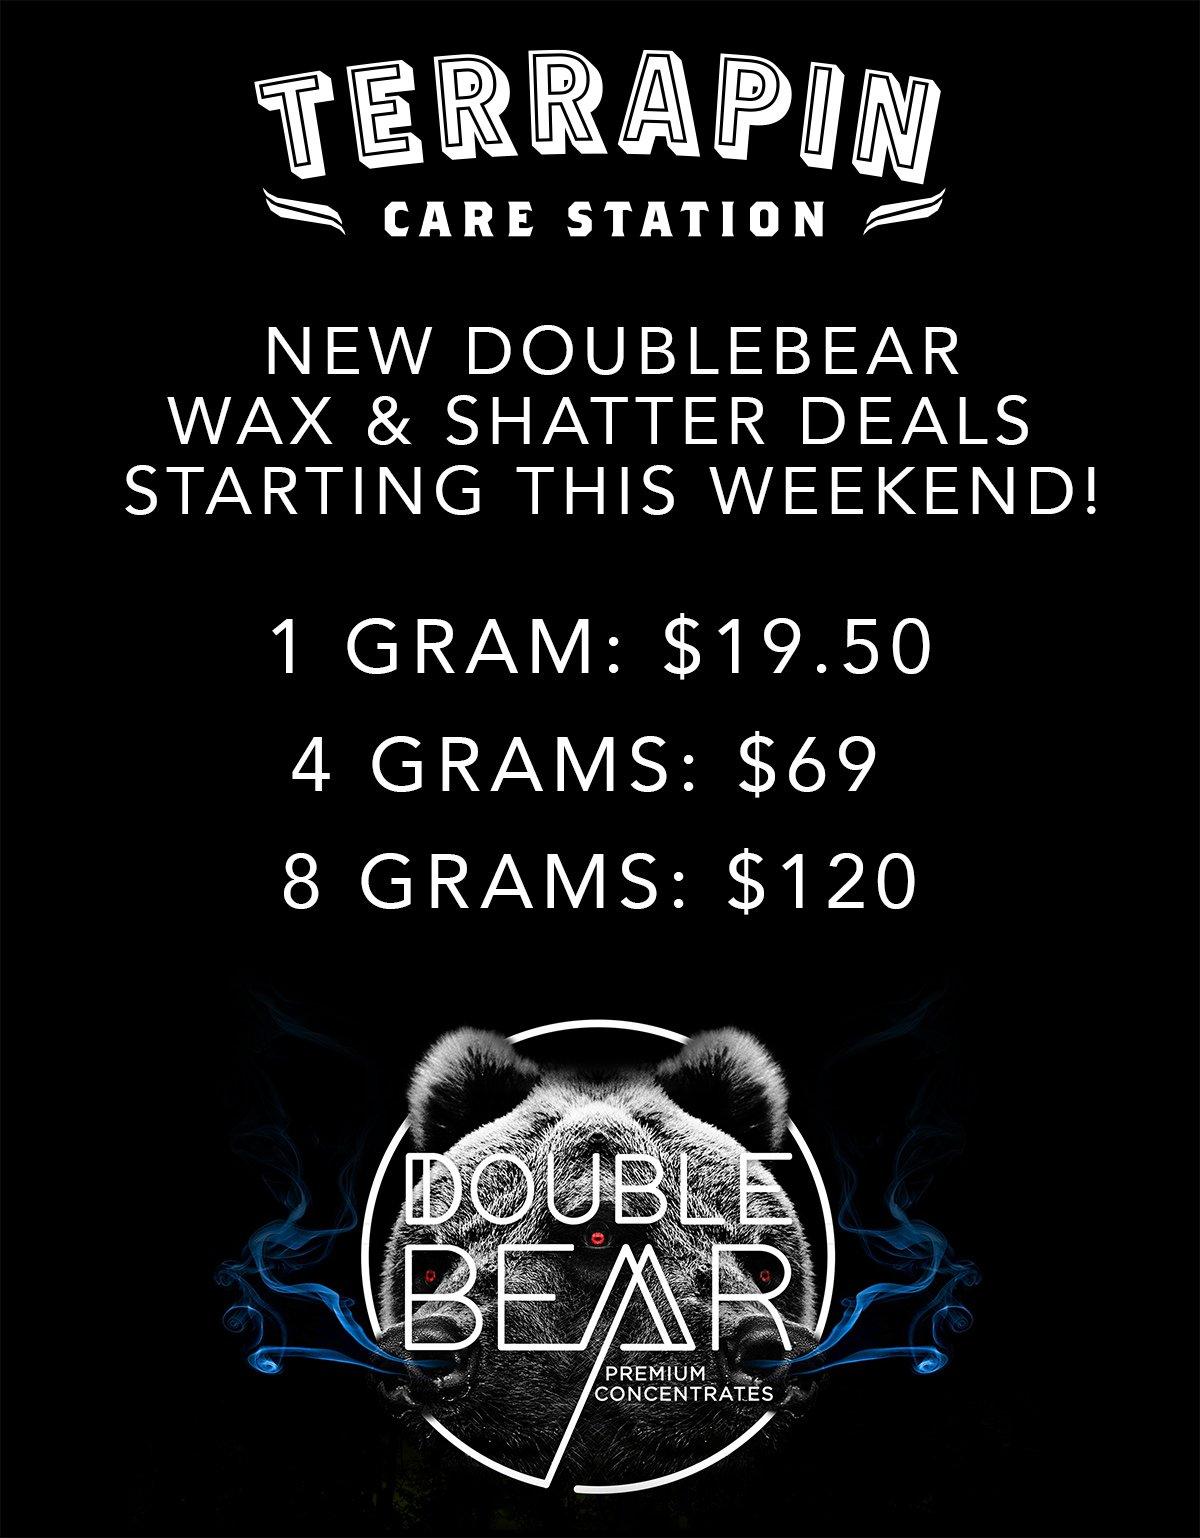 "TerrapinCareStation on Twitter: ""NEW DOUBLEBEAR WAX & SHATTER DEALS STARTING THIS WEEKEND! 1 gram: $19.50 4 grAms: $69 8 grams: $120 #doublebearconcentrates ..."